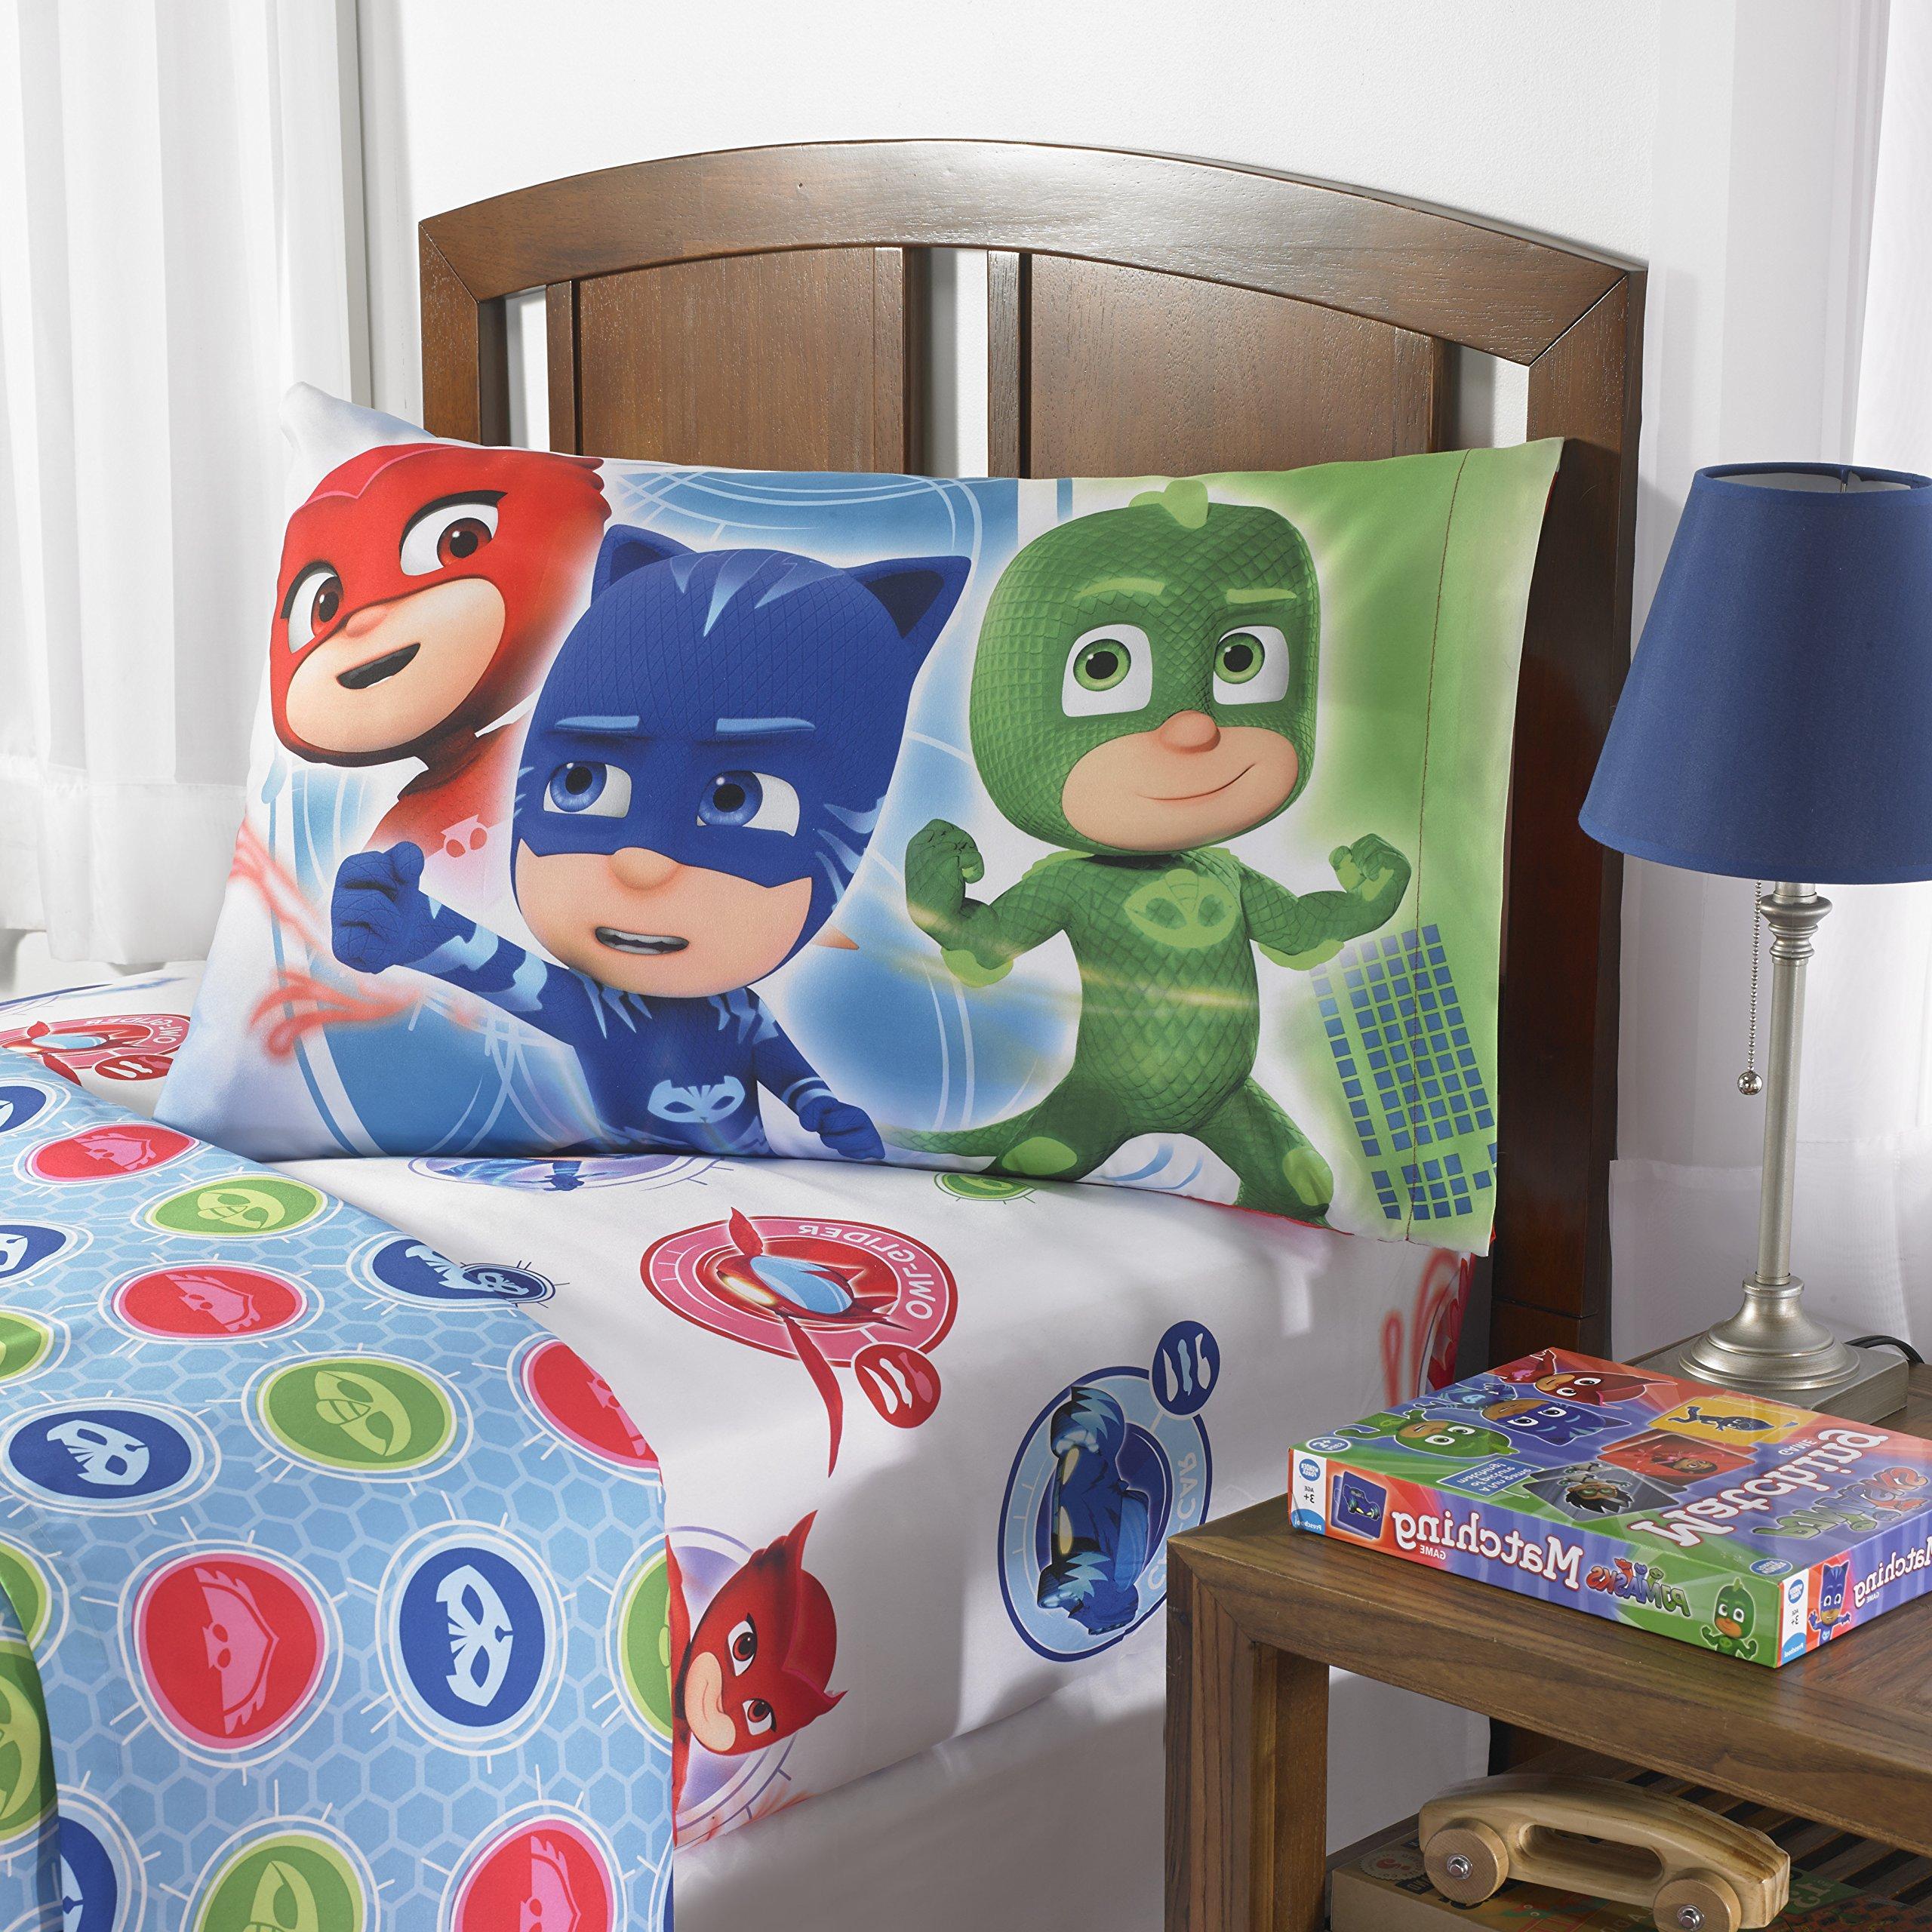 Ln 3 Piece Kids Red Pj Mask Sheet Set Twin, Blue Cat Boy Bedding Cartoon Character Green Adventure Themed Bed Sheets Ouellet Gekko Reversible Soft Cozy Comfortable Durable, Polyester